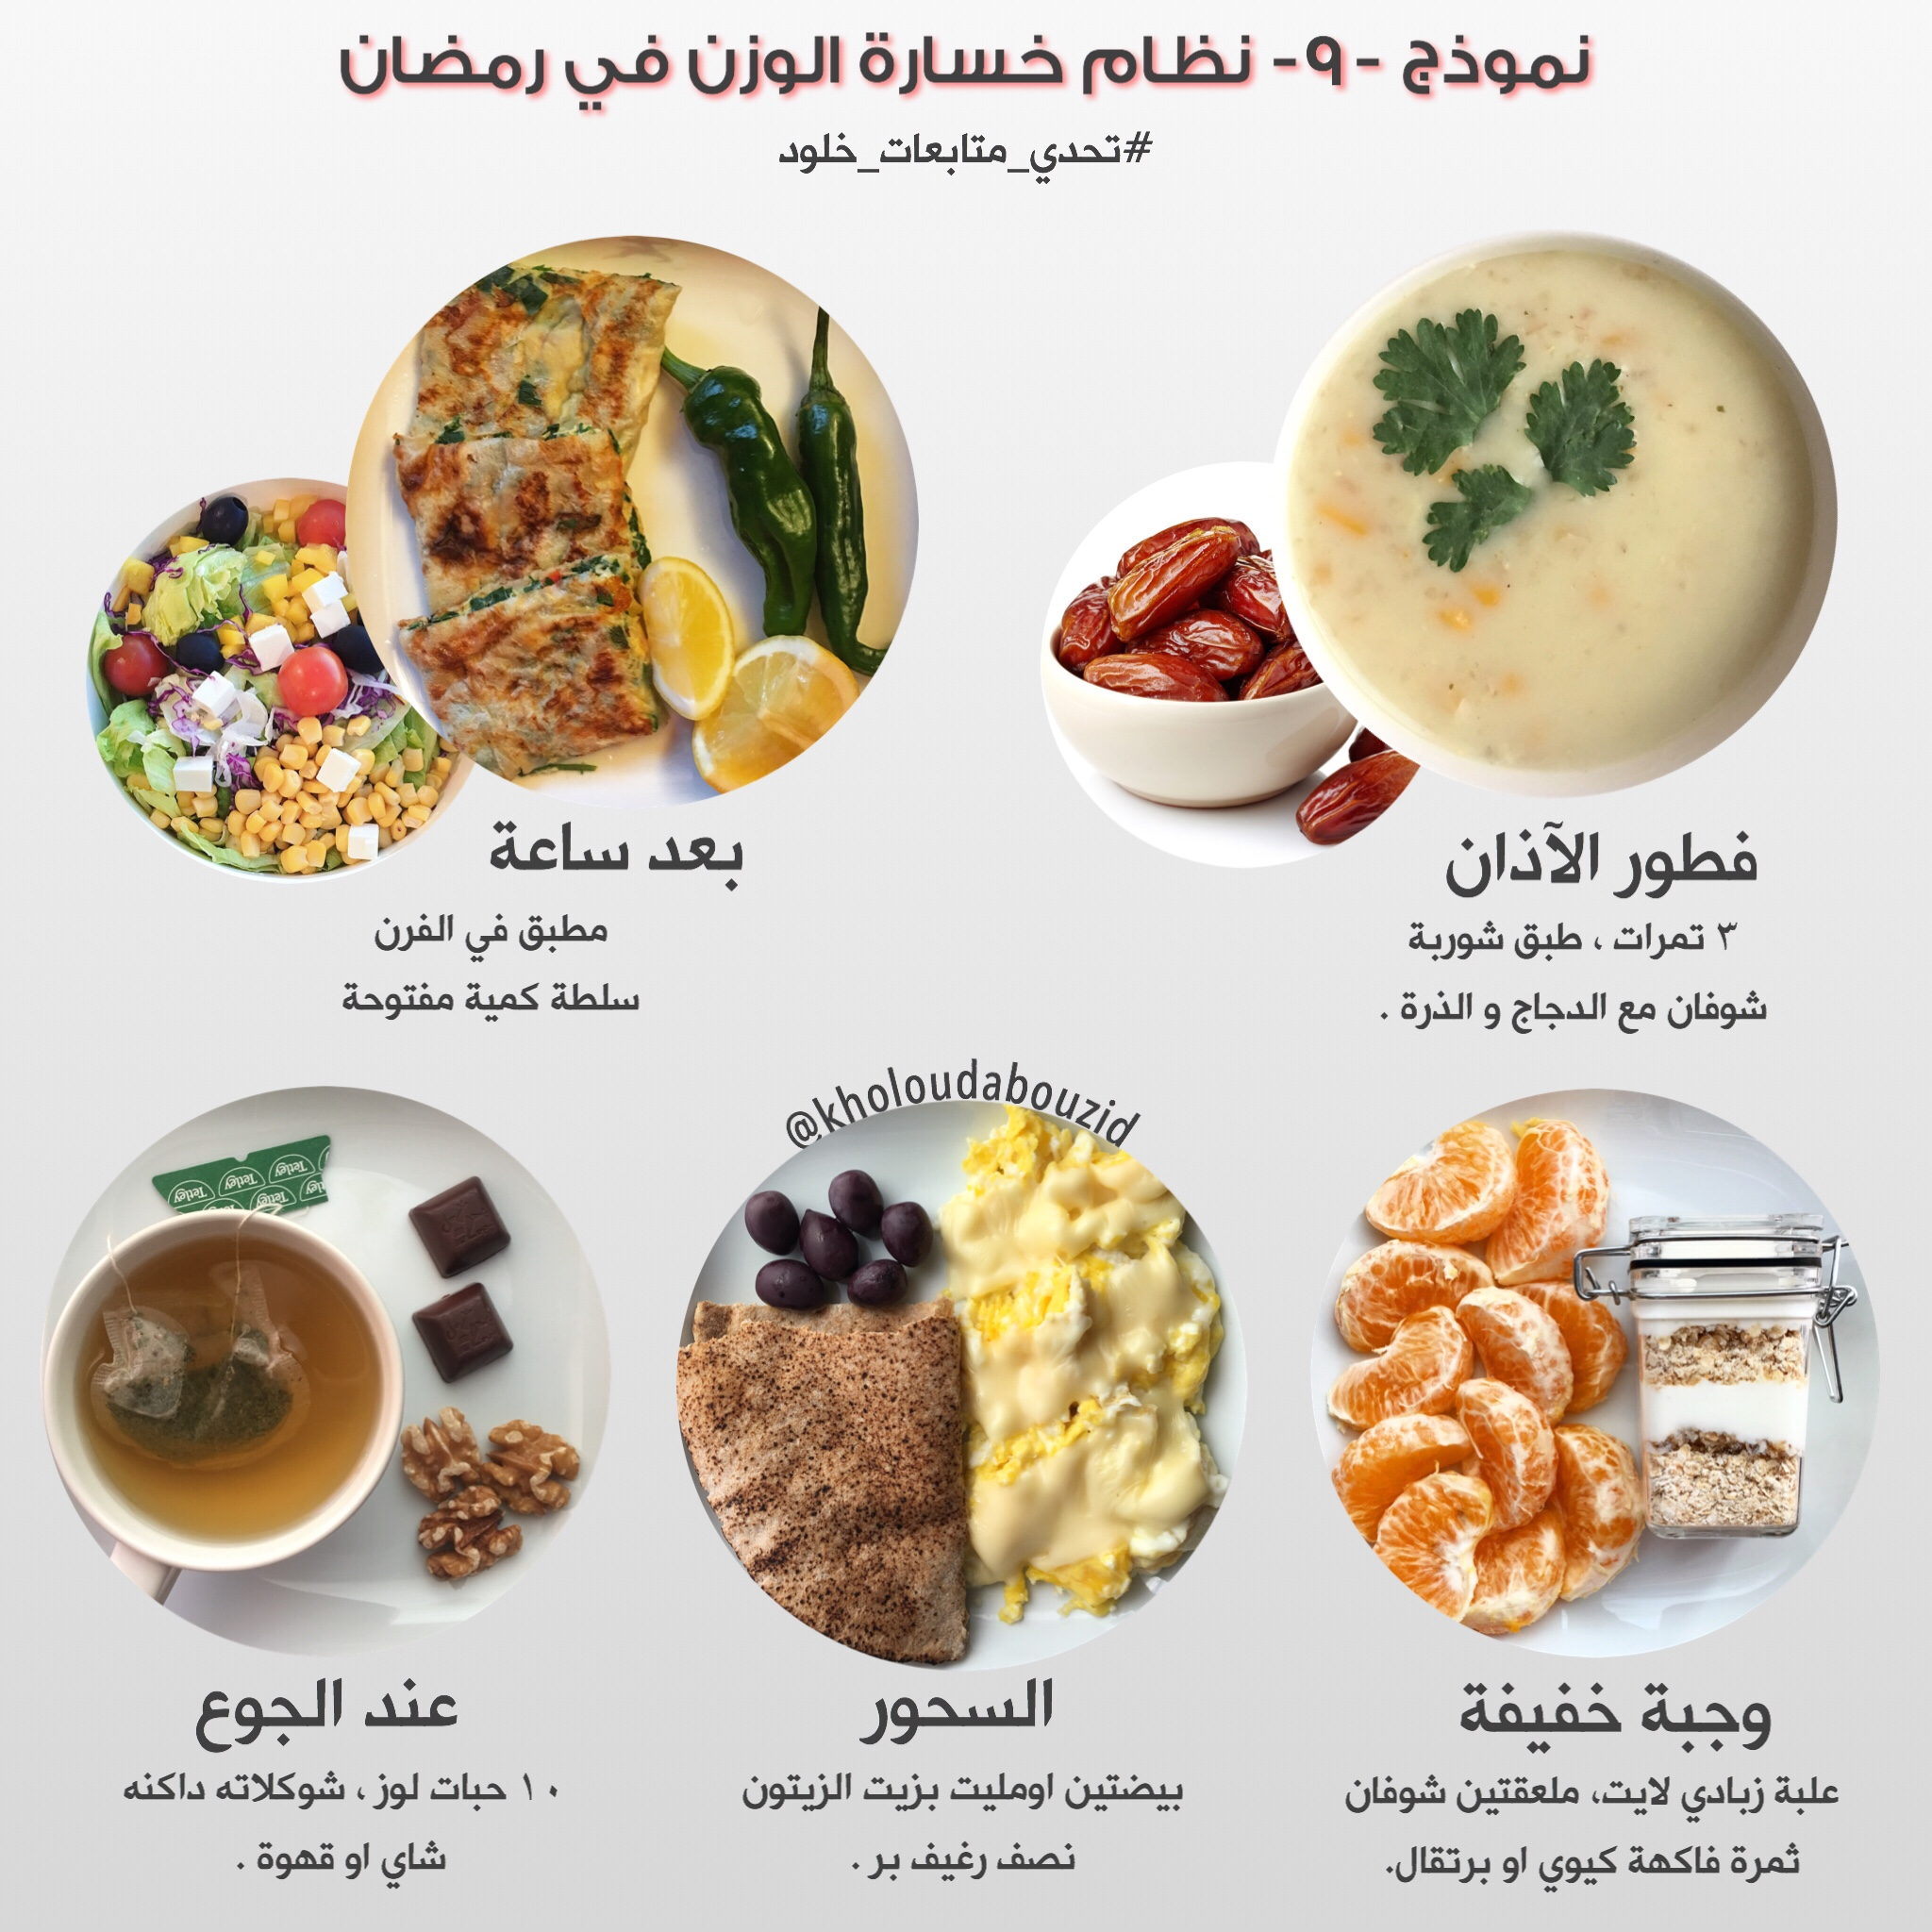 مثال علي نظام غذايي لانقاص الوزن في رمضان رمضان و الرجيم نظام غذائى لشهر رمضان